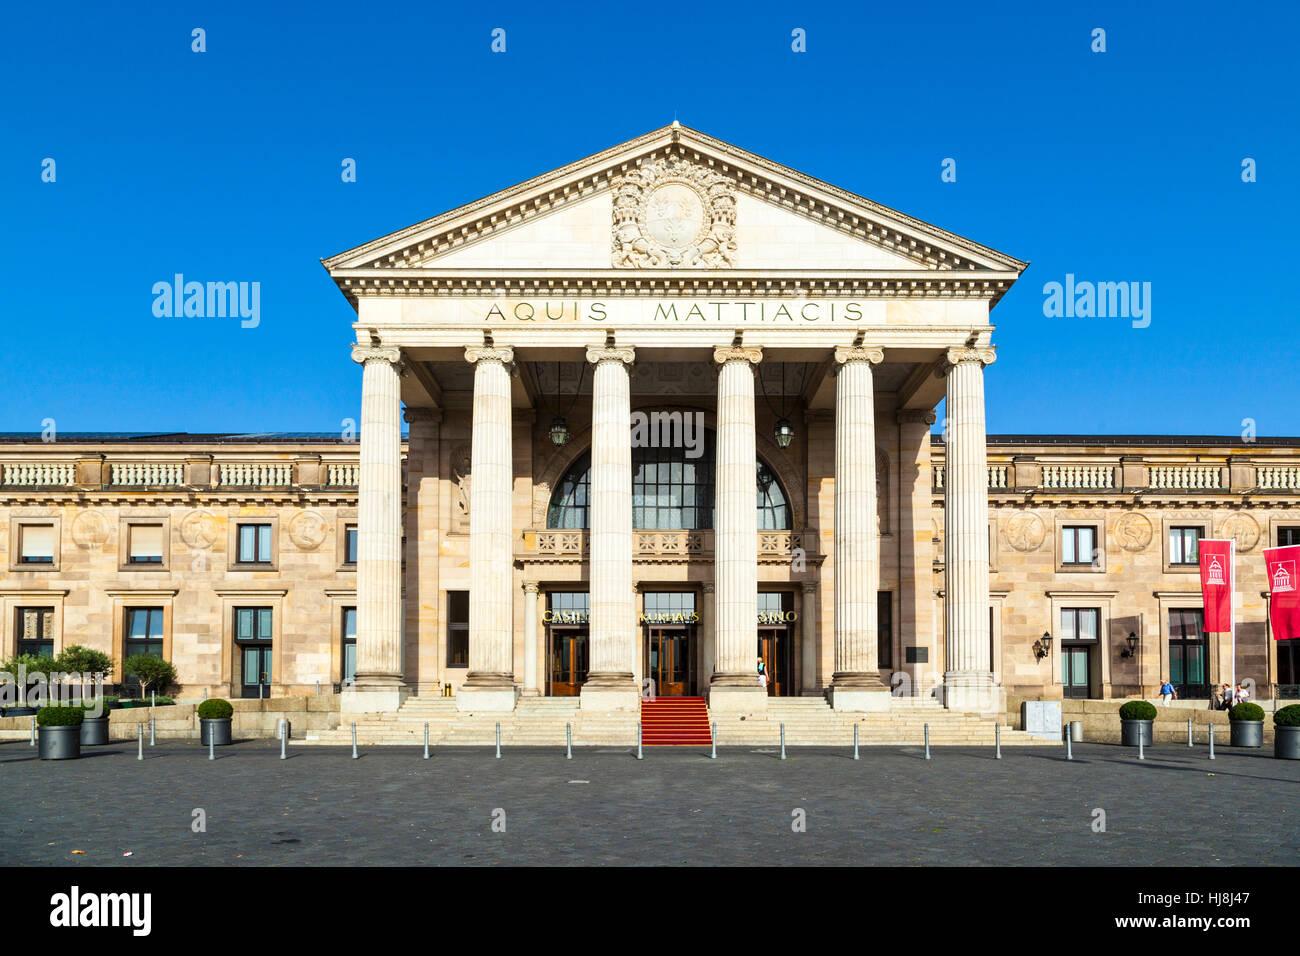 restaurant, city, town, park, casino, facade, spa, mineral spring, medicinal - Stock Image